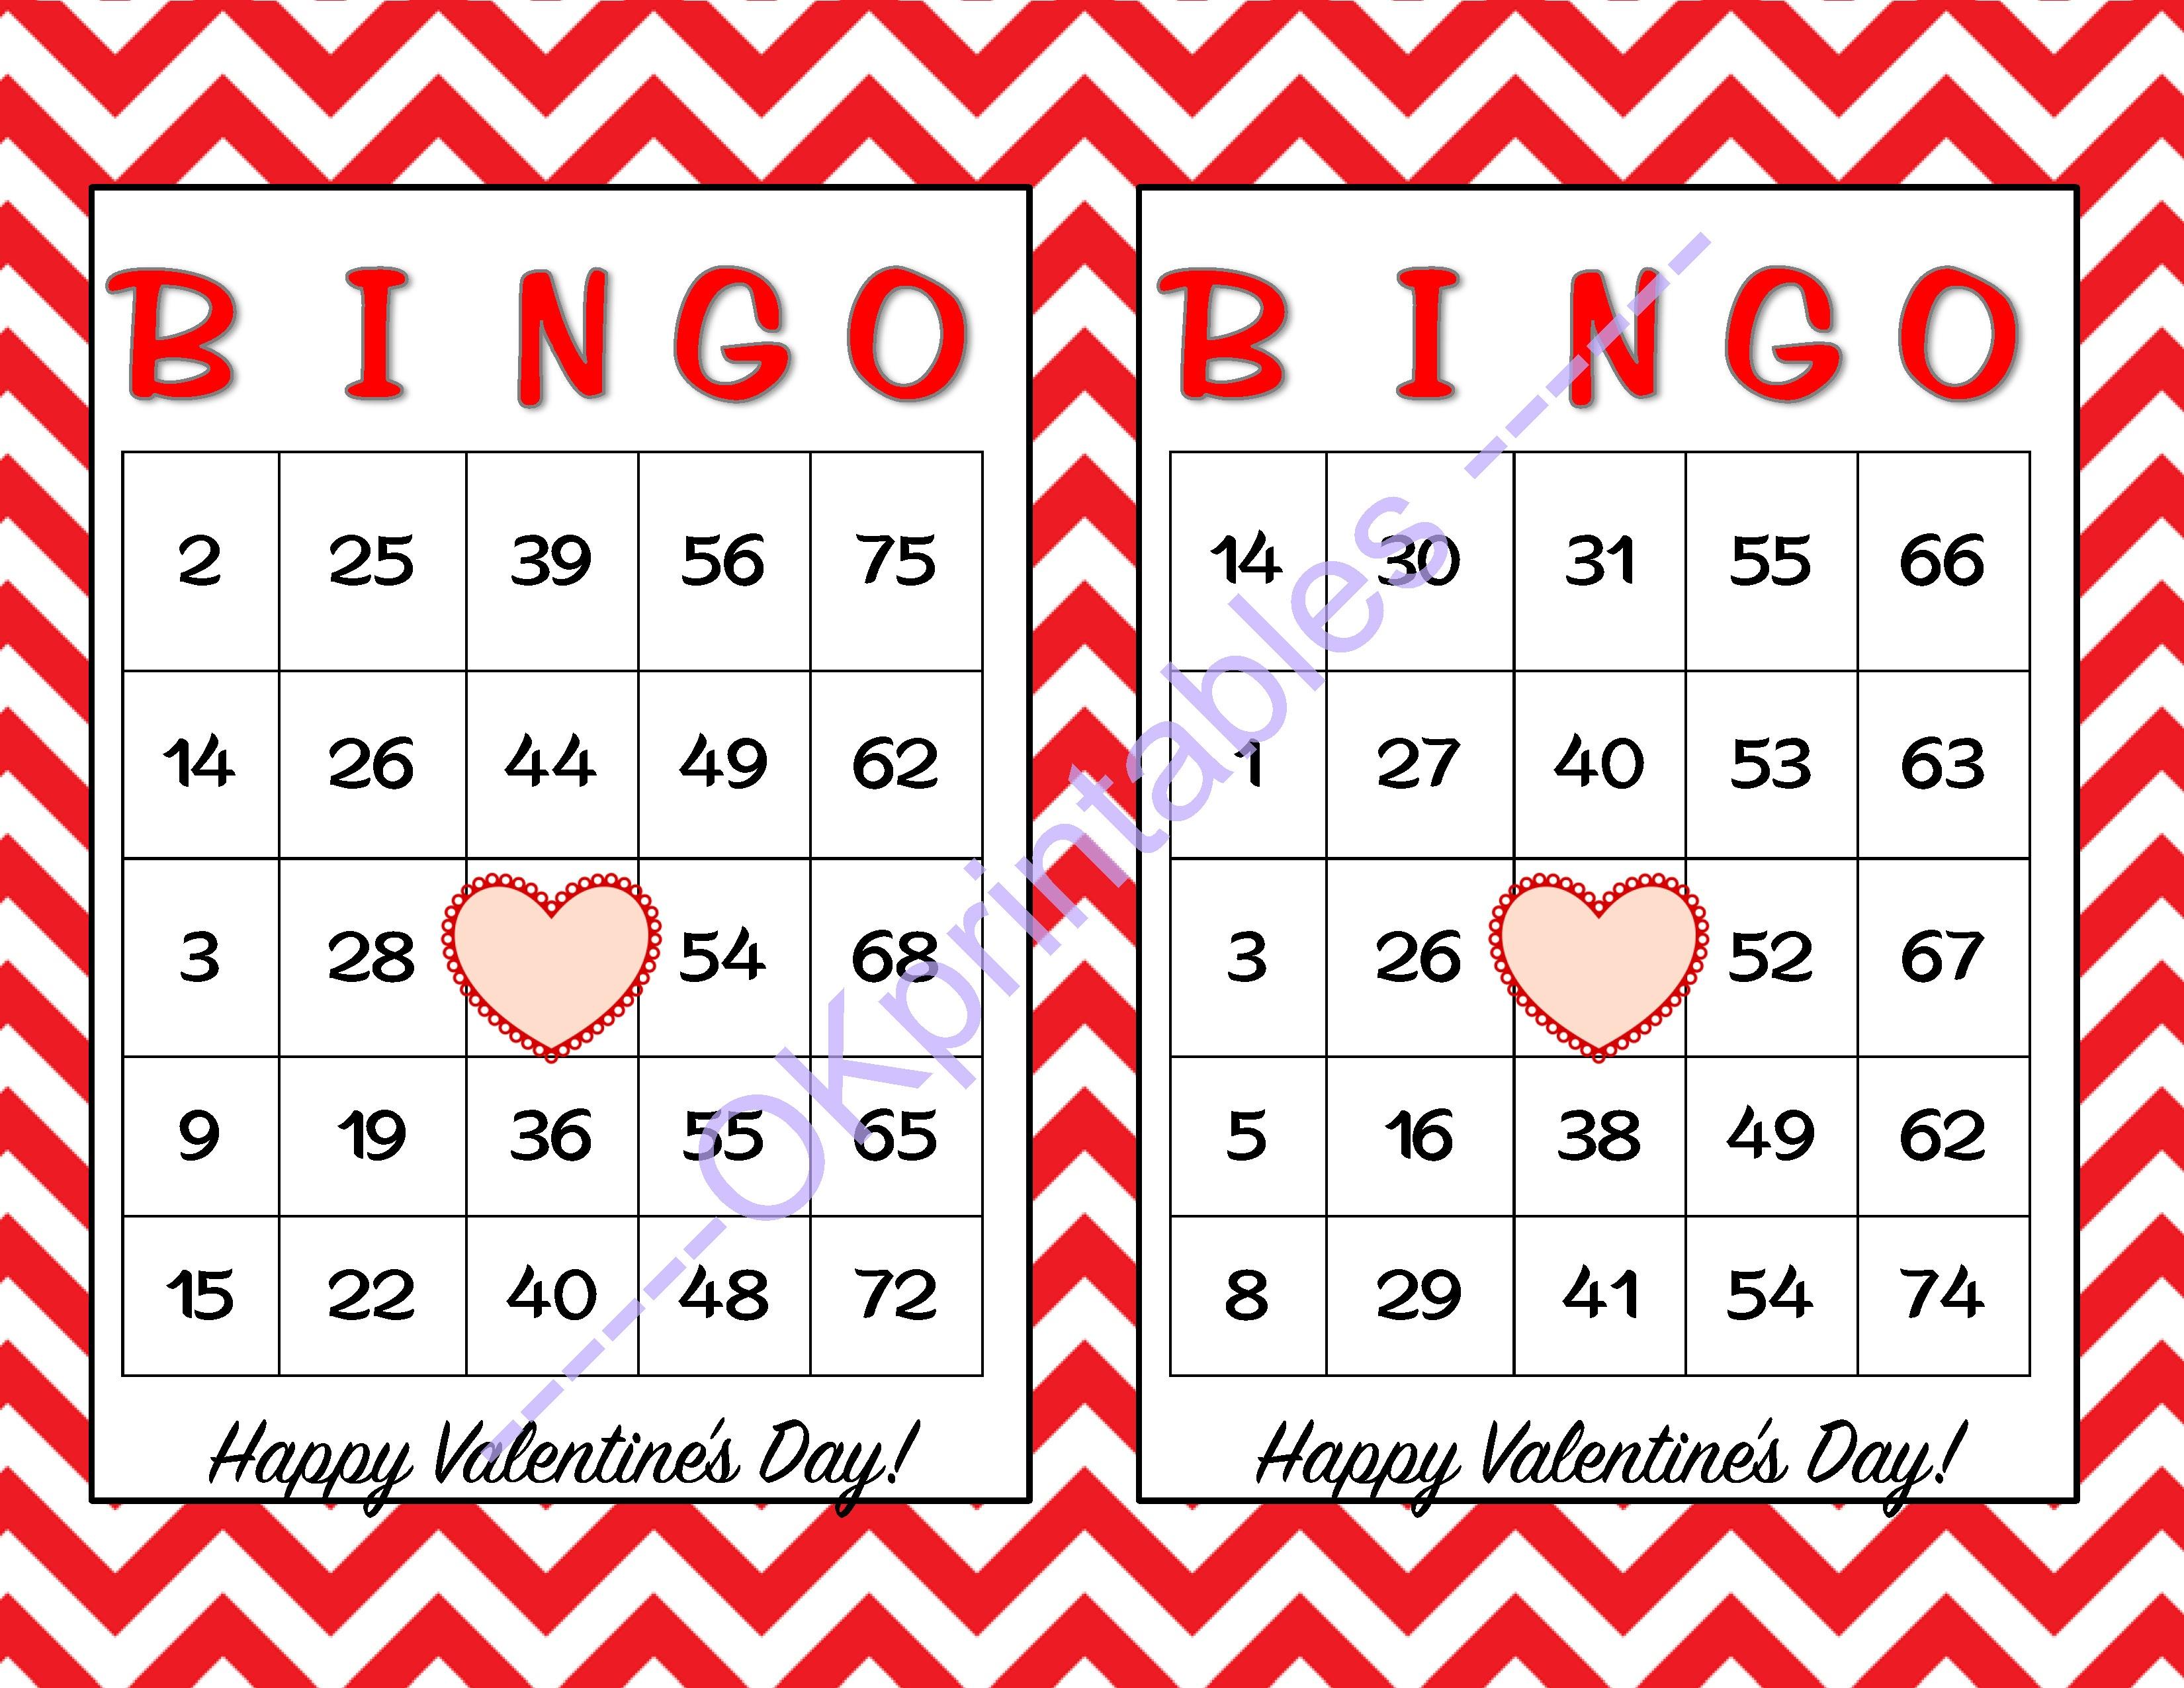 30 Happy Valentines Day Bingo Cards - Printable Valentines Game Party -  School Valentines Game - Free Printable Bingo Cards Random Numbers